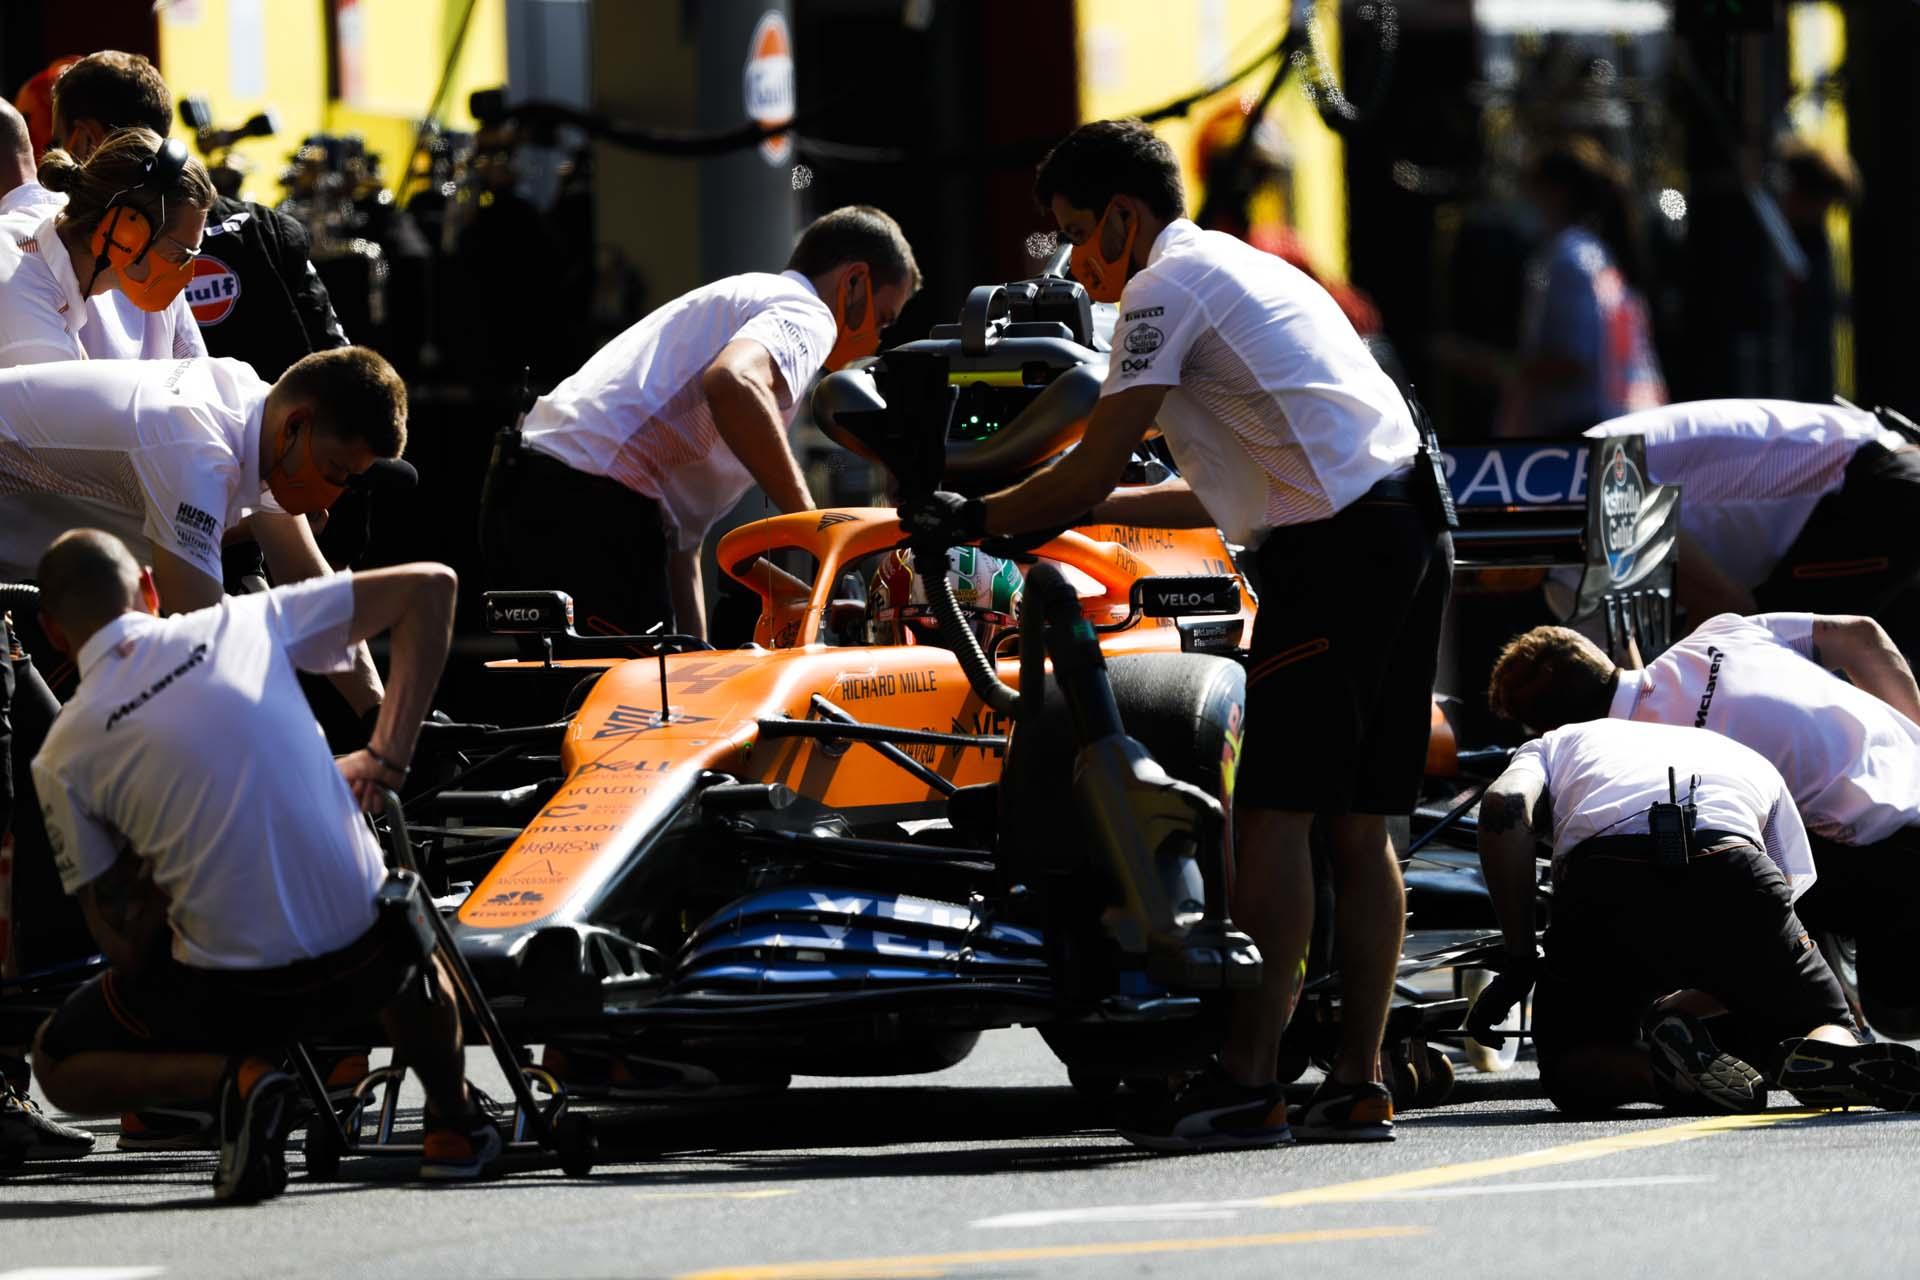 Lando Norris, McLaren MCL35, in the pits